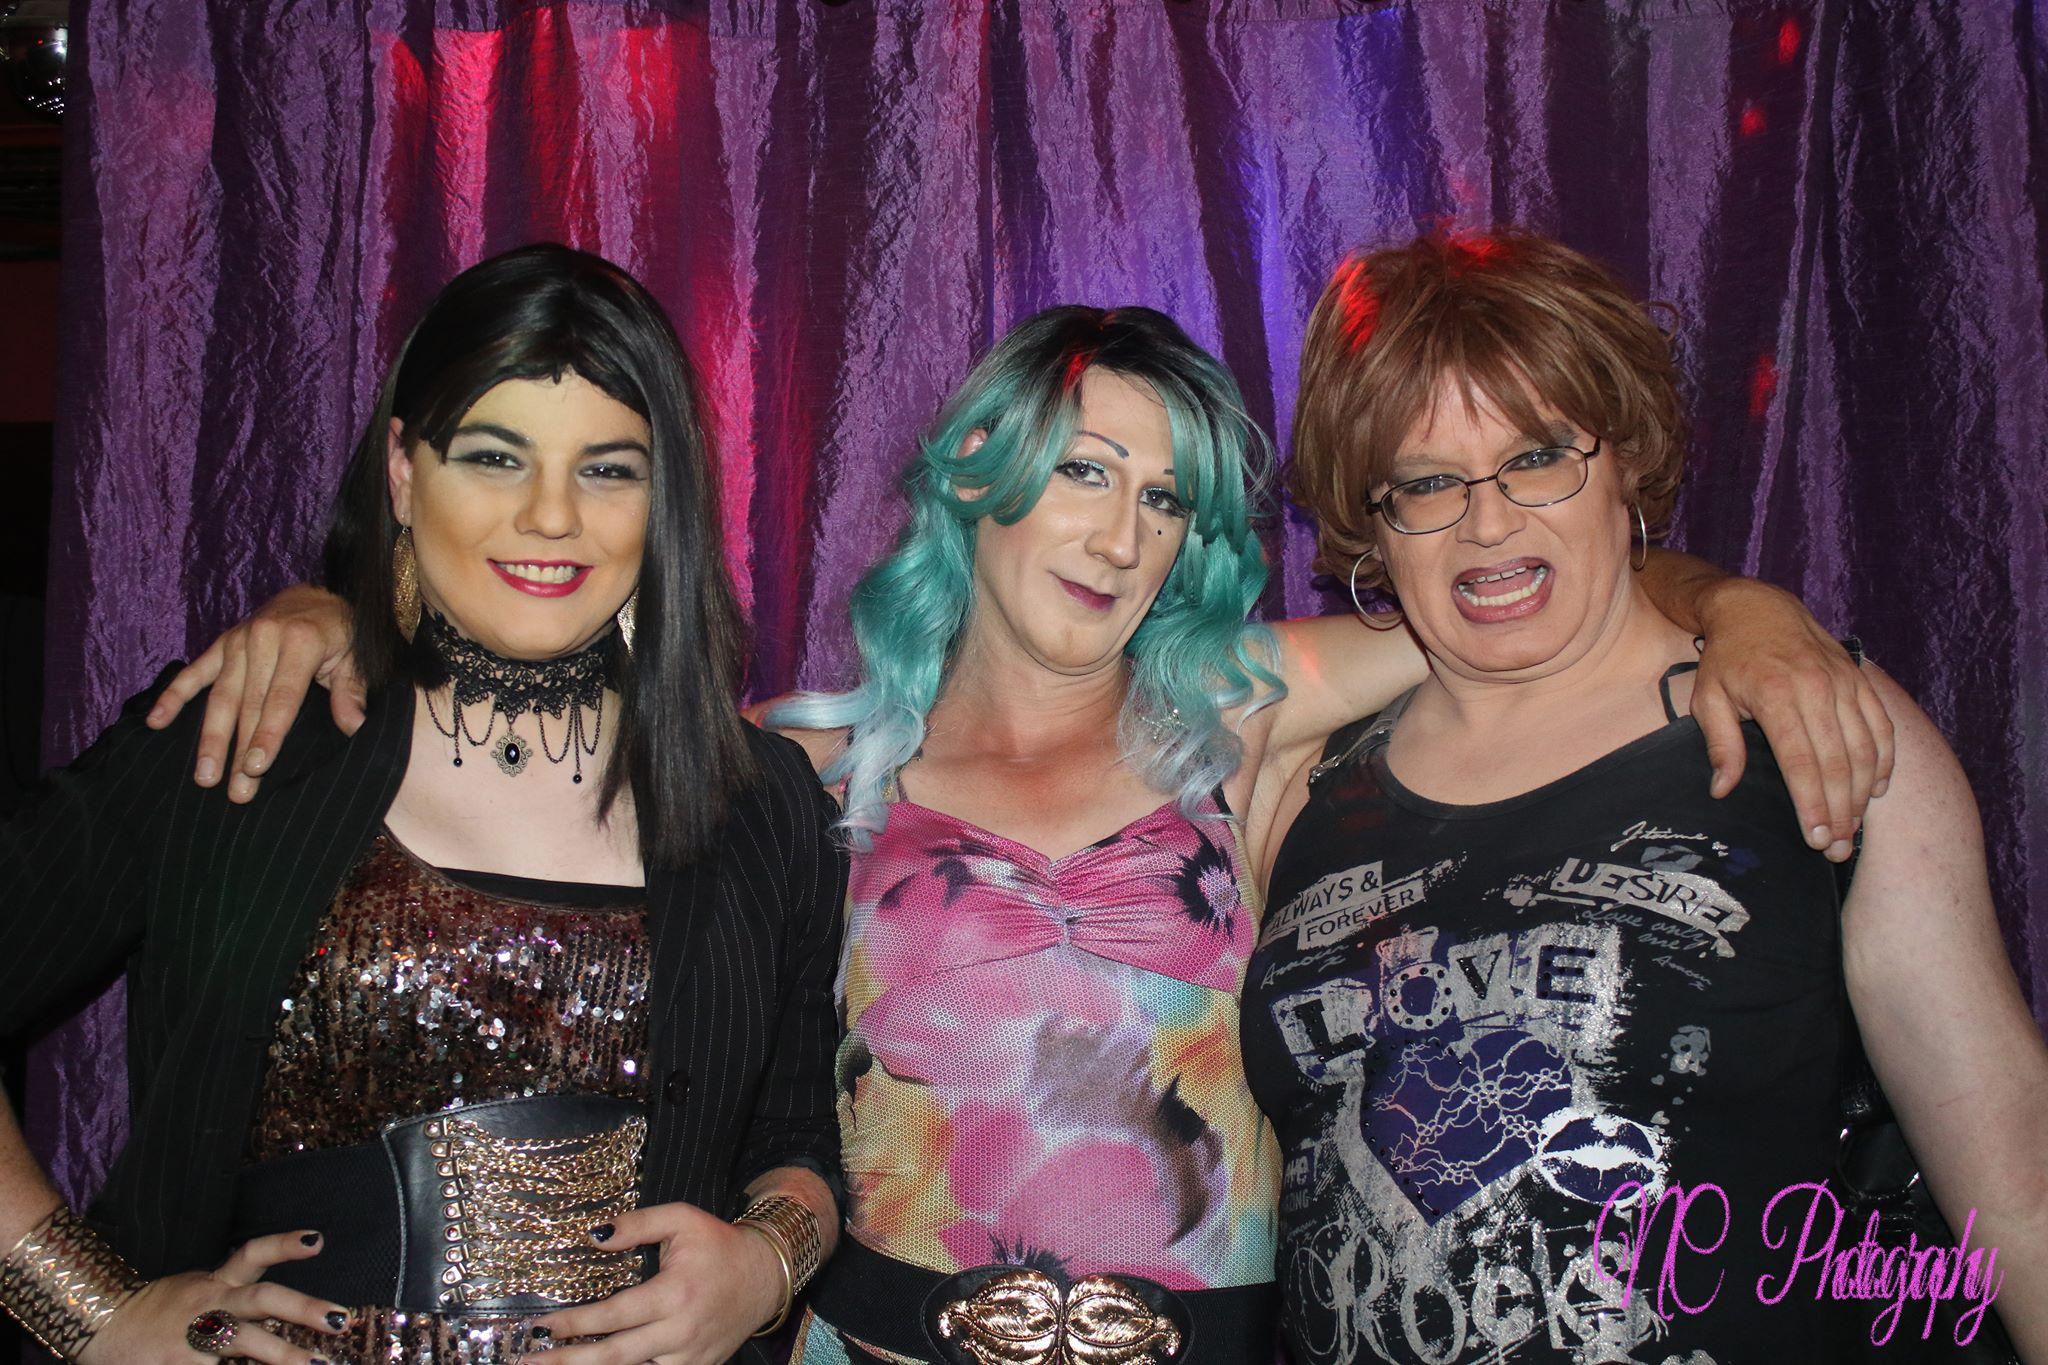 Swizzles Ottawa Thursday Drag Show